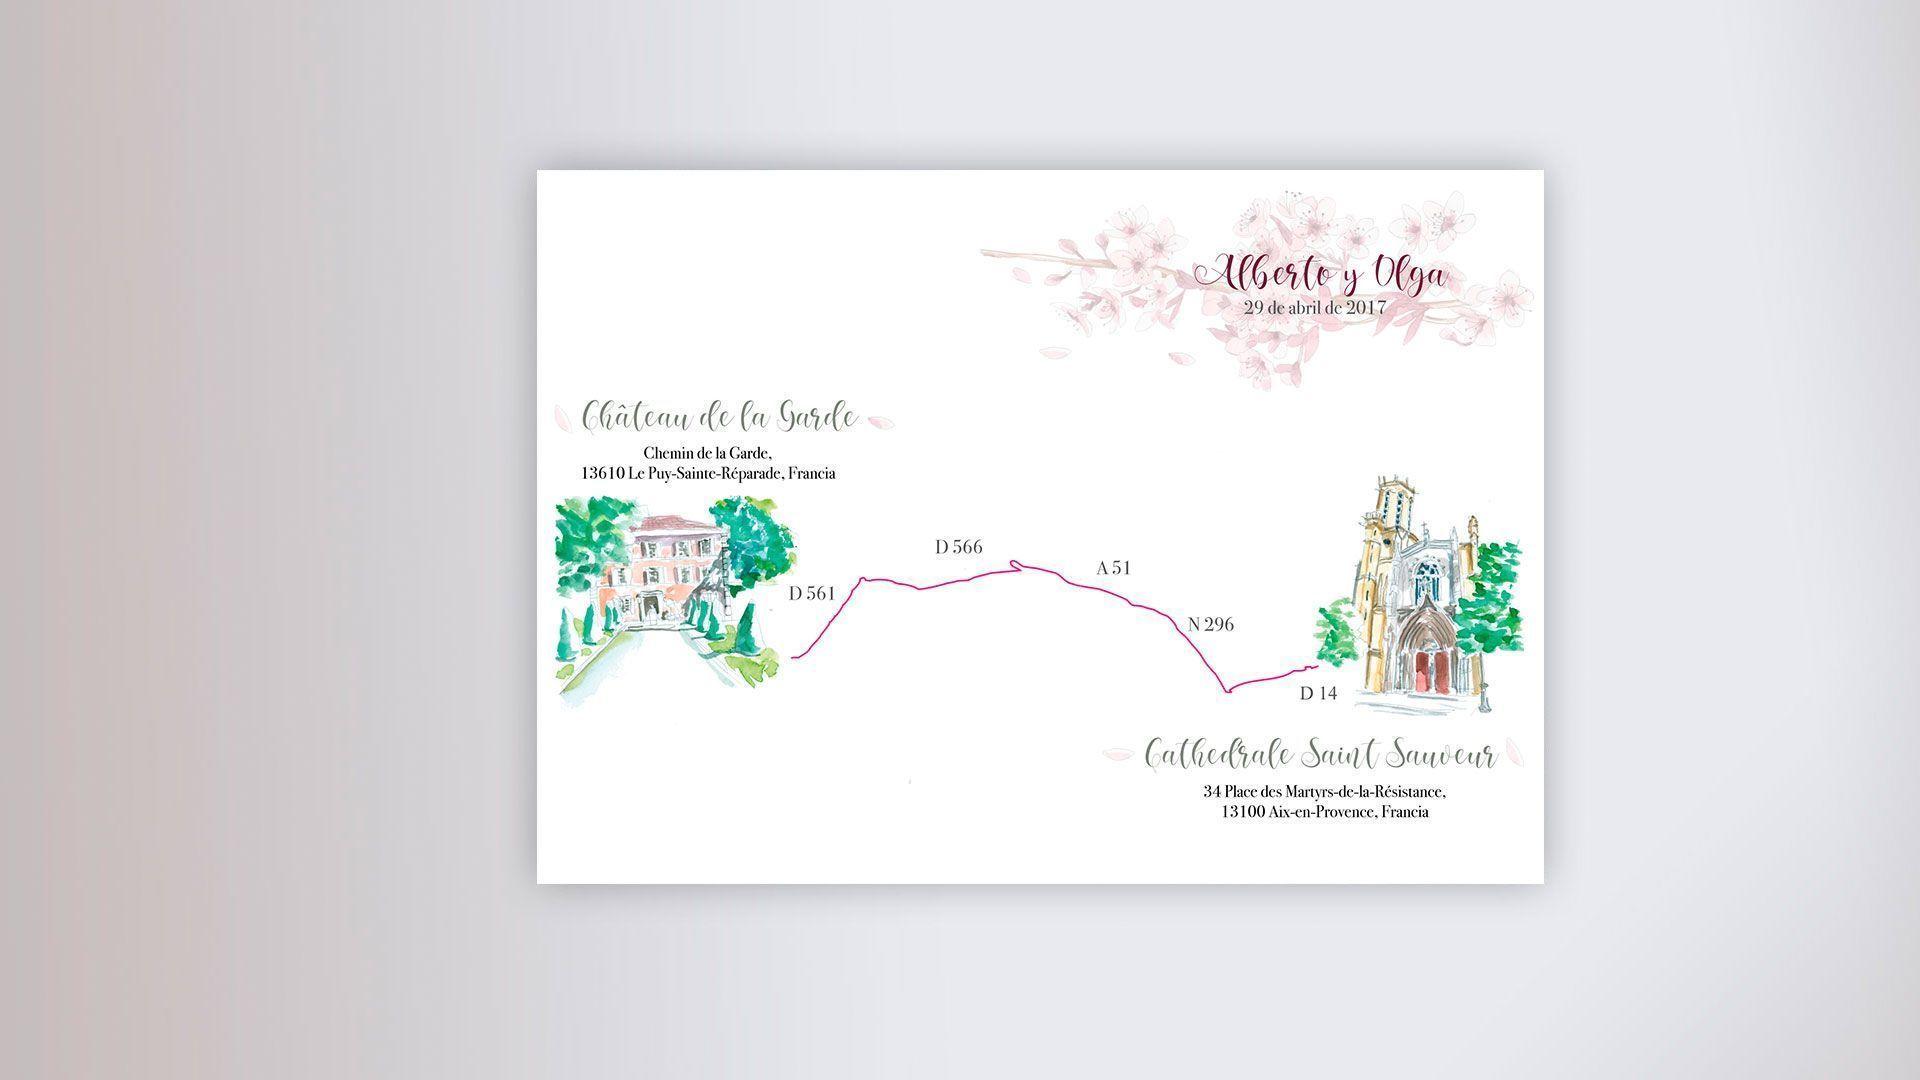 Mapa acuarela dibujos invitación boda